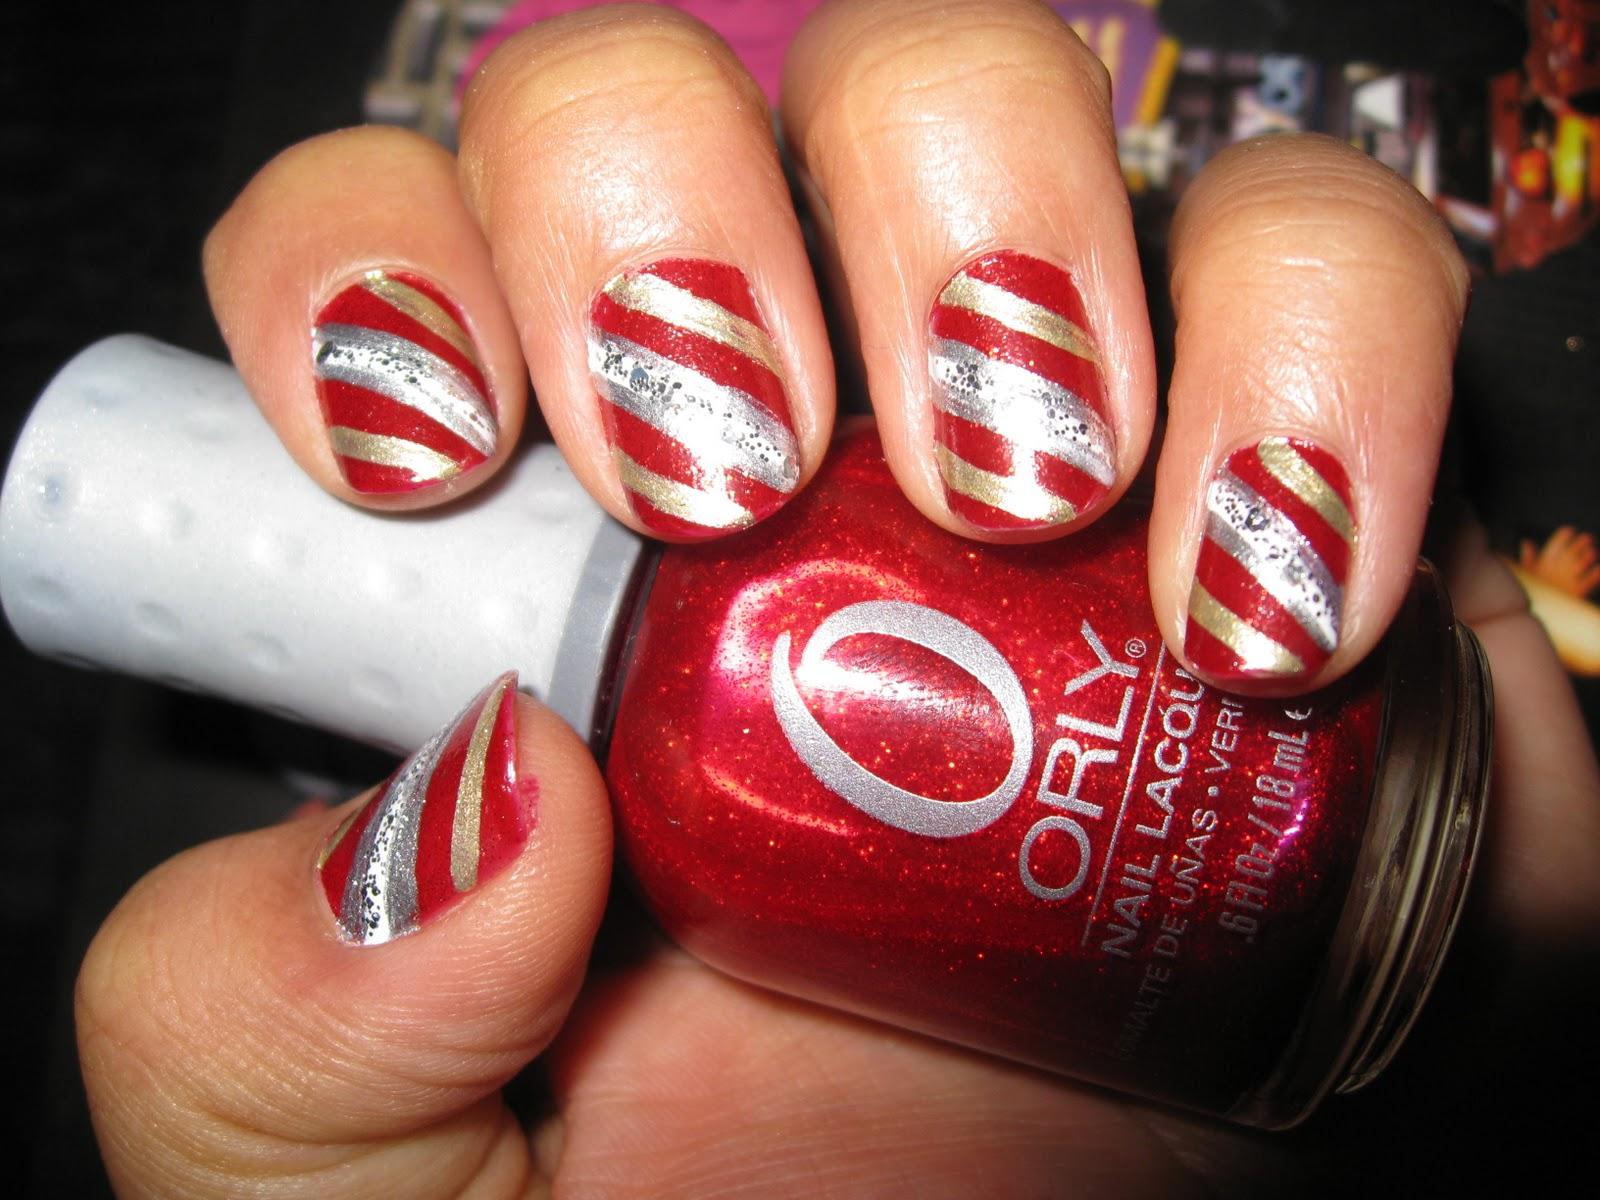 http://2.bp.blogspot.com/_t4dHqEtkFmo/TRZpW8906uI/AAAAAAAAADY/4OGOQNeE9eM/s1600/holiday+nails+115.JPG